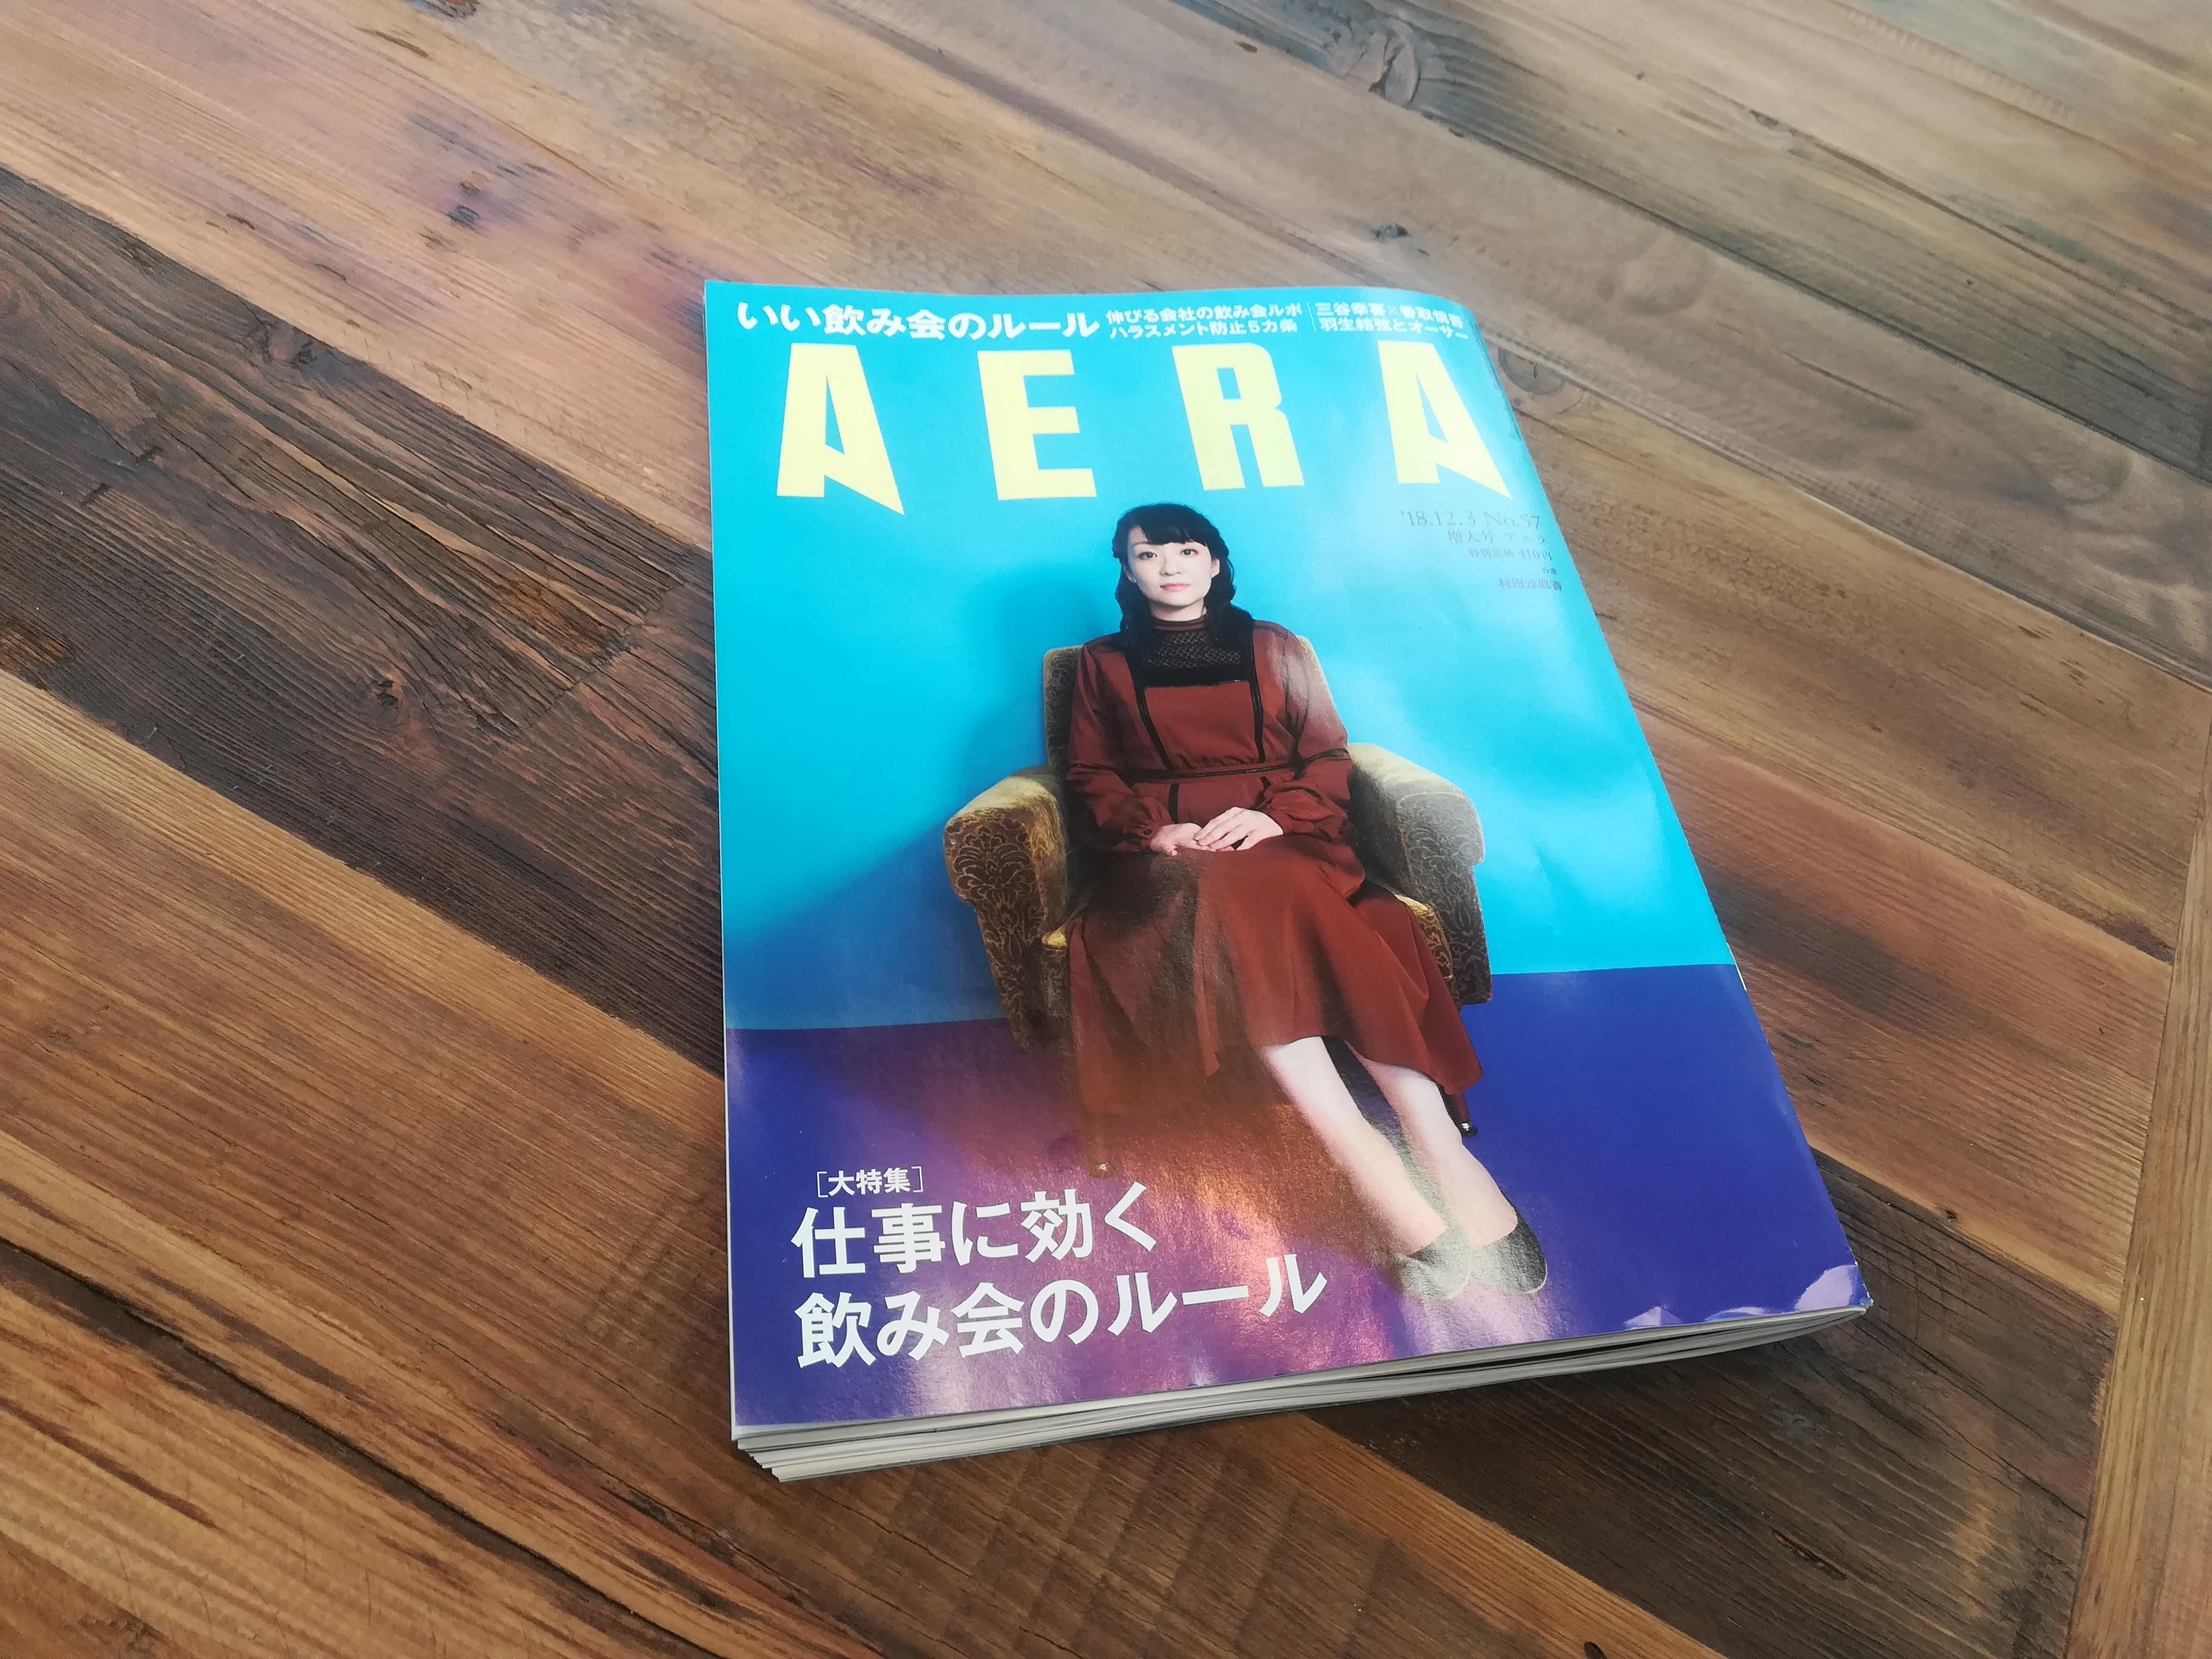 「AERA 18.12.3 No.57増大号」にて社内イベントTGIFの取り組みが紹介されました。